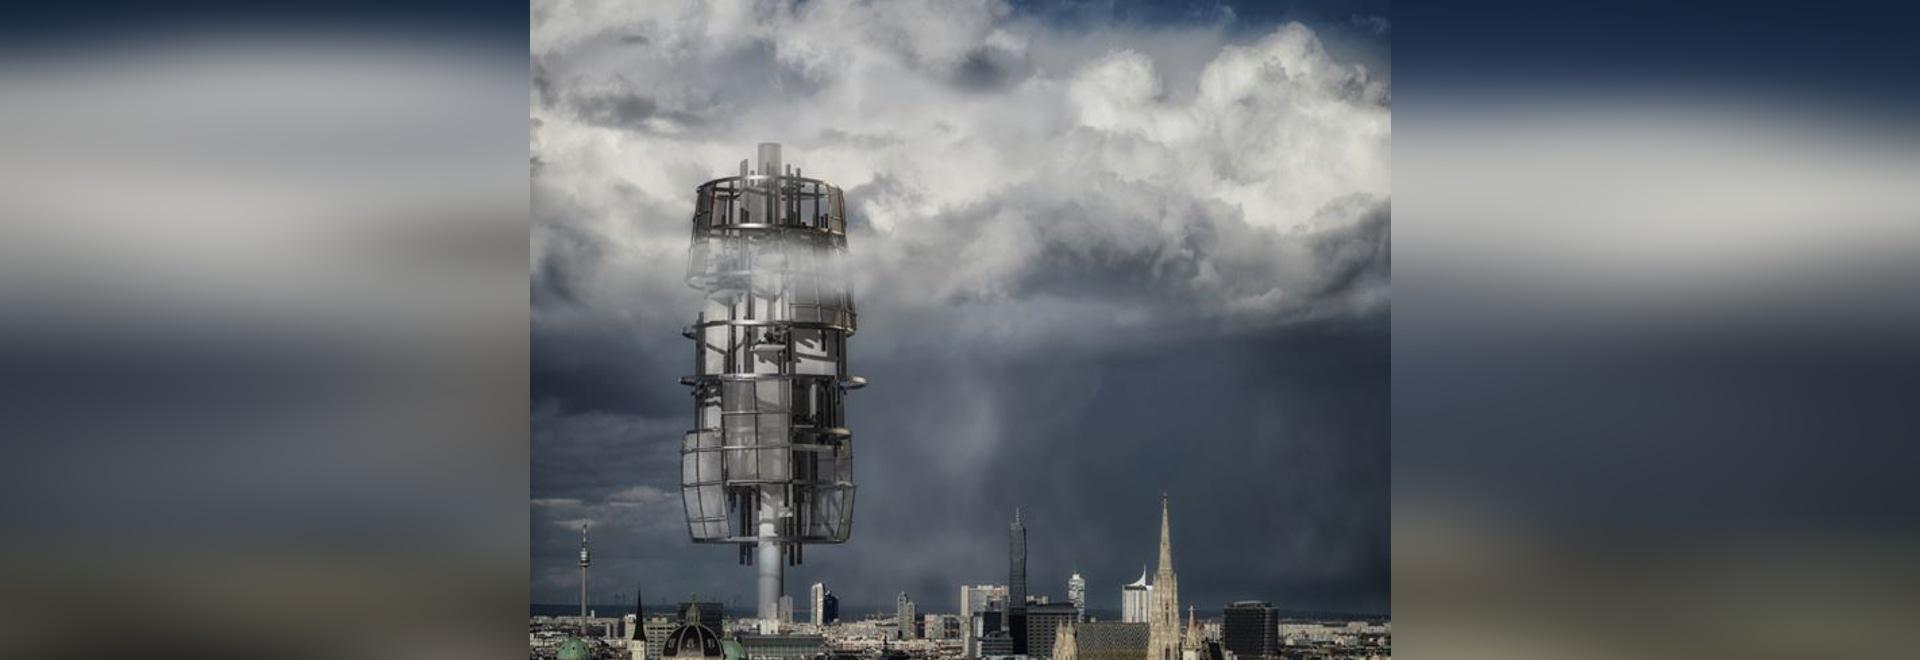 ENERGY - LAND - TOWER